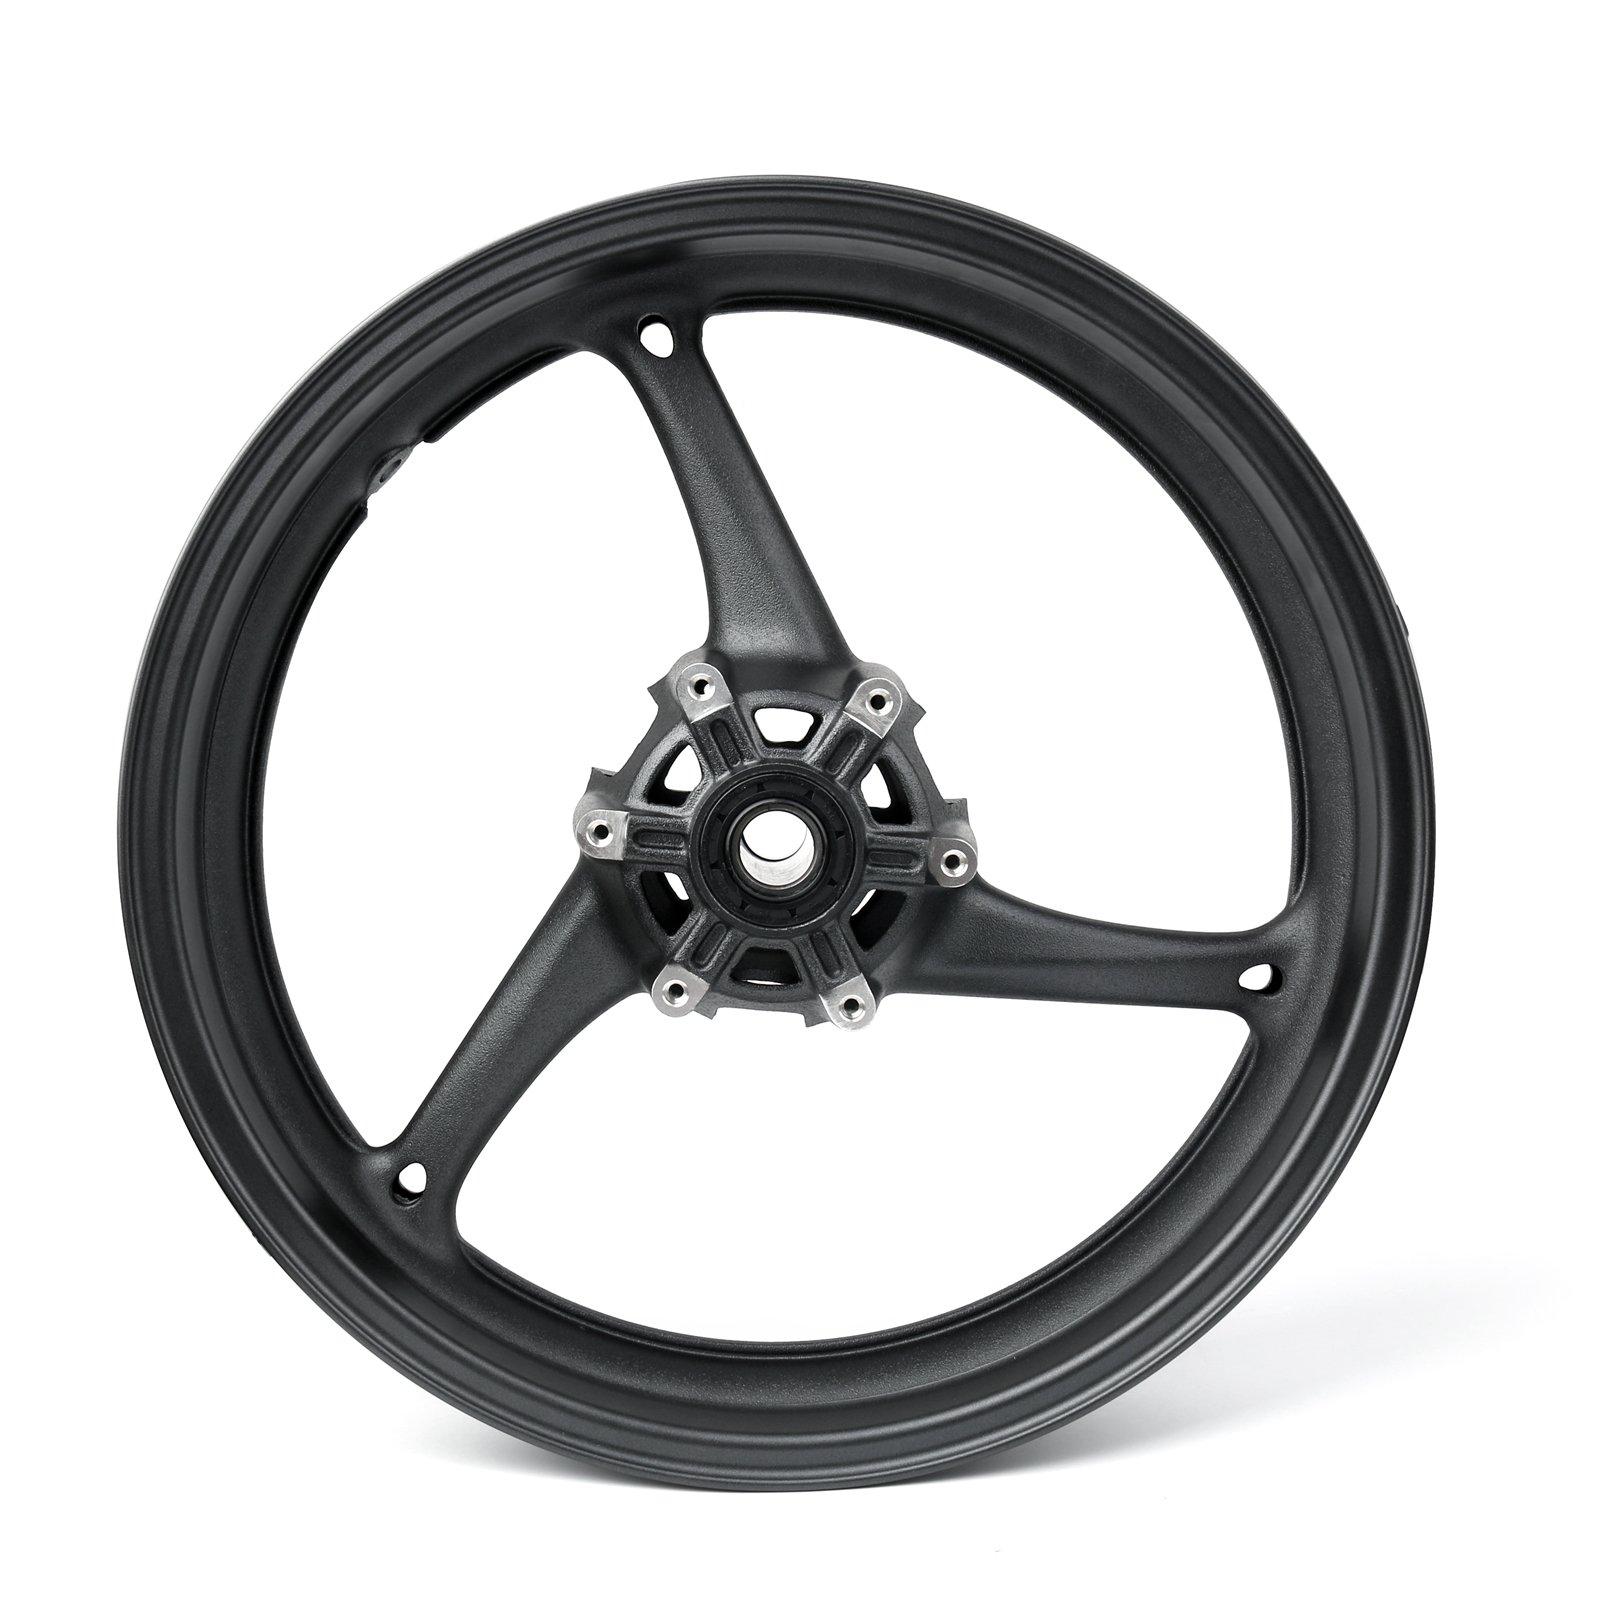 JFG RACING Motorcycle Silver Rear Foot Pegs Bracket Rests Pedal Footpeg Footrest For Suzuki GSXR600 GSXR750 96-05 00 GSXR1000 01-04